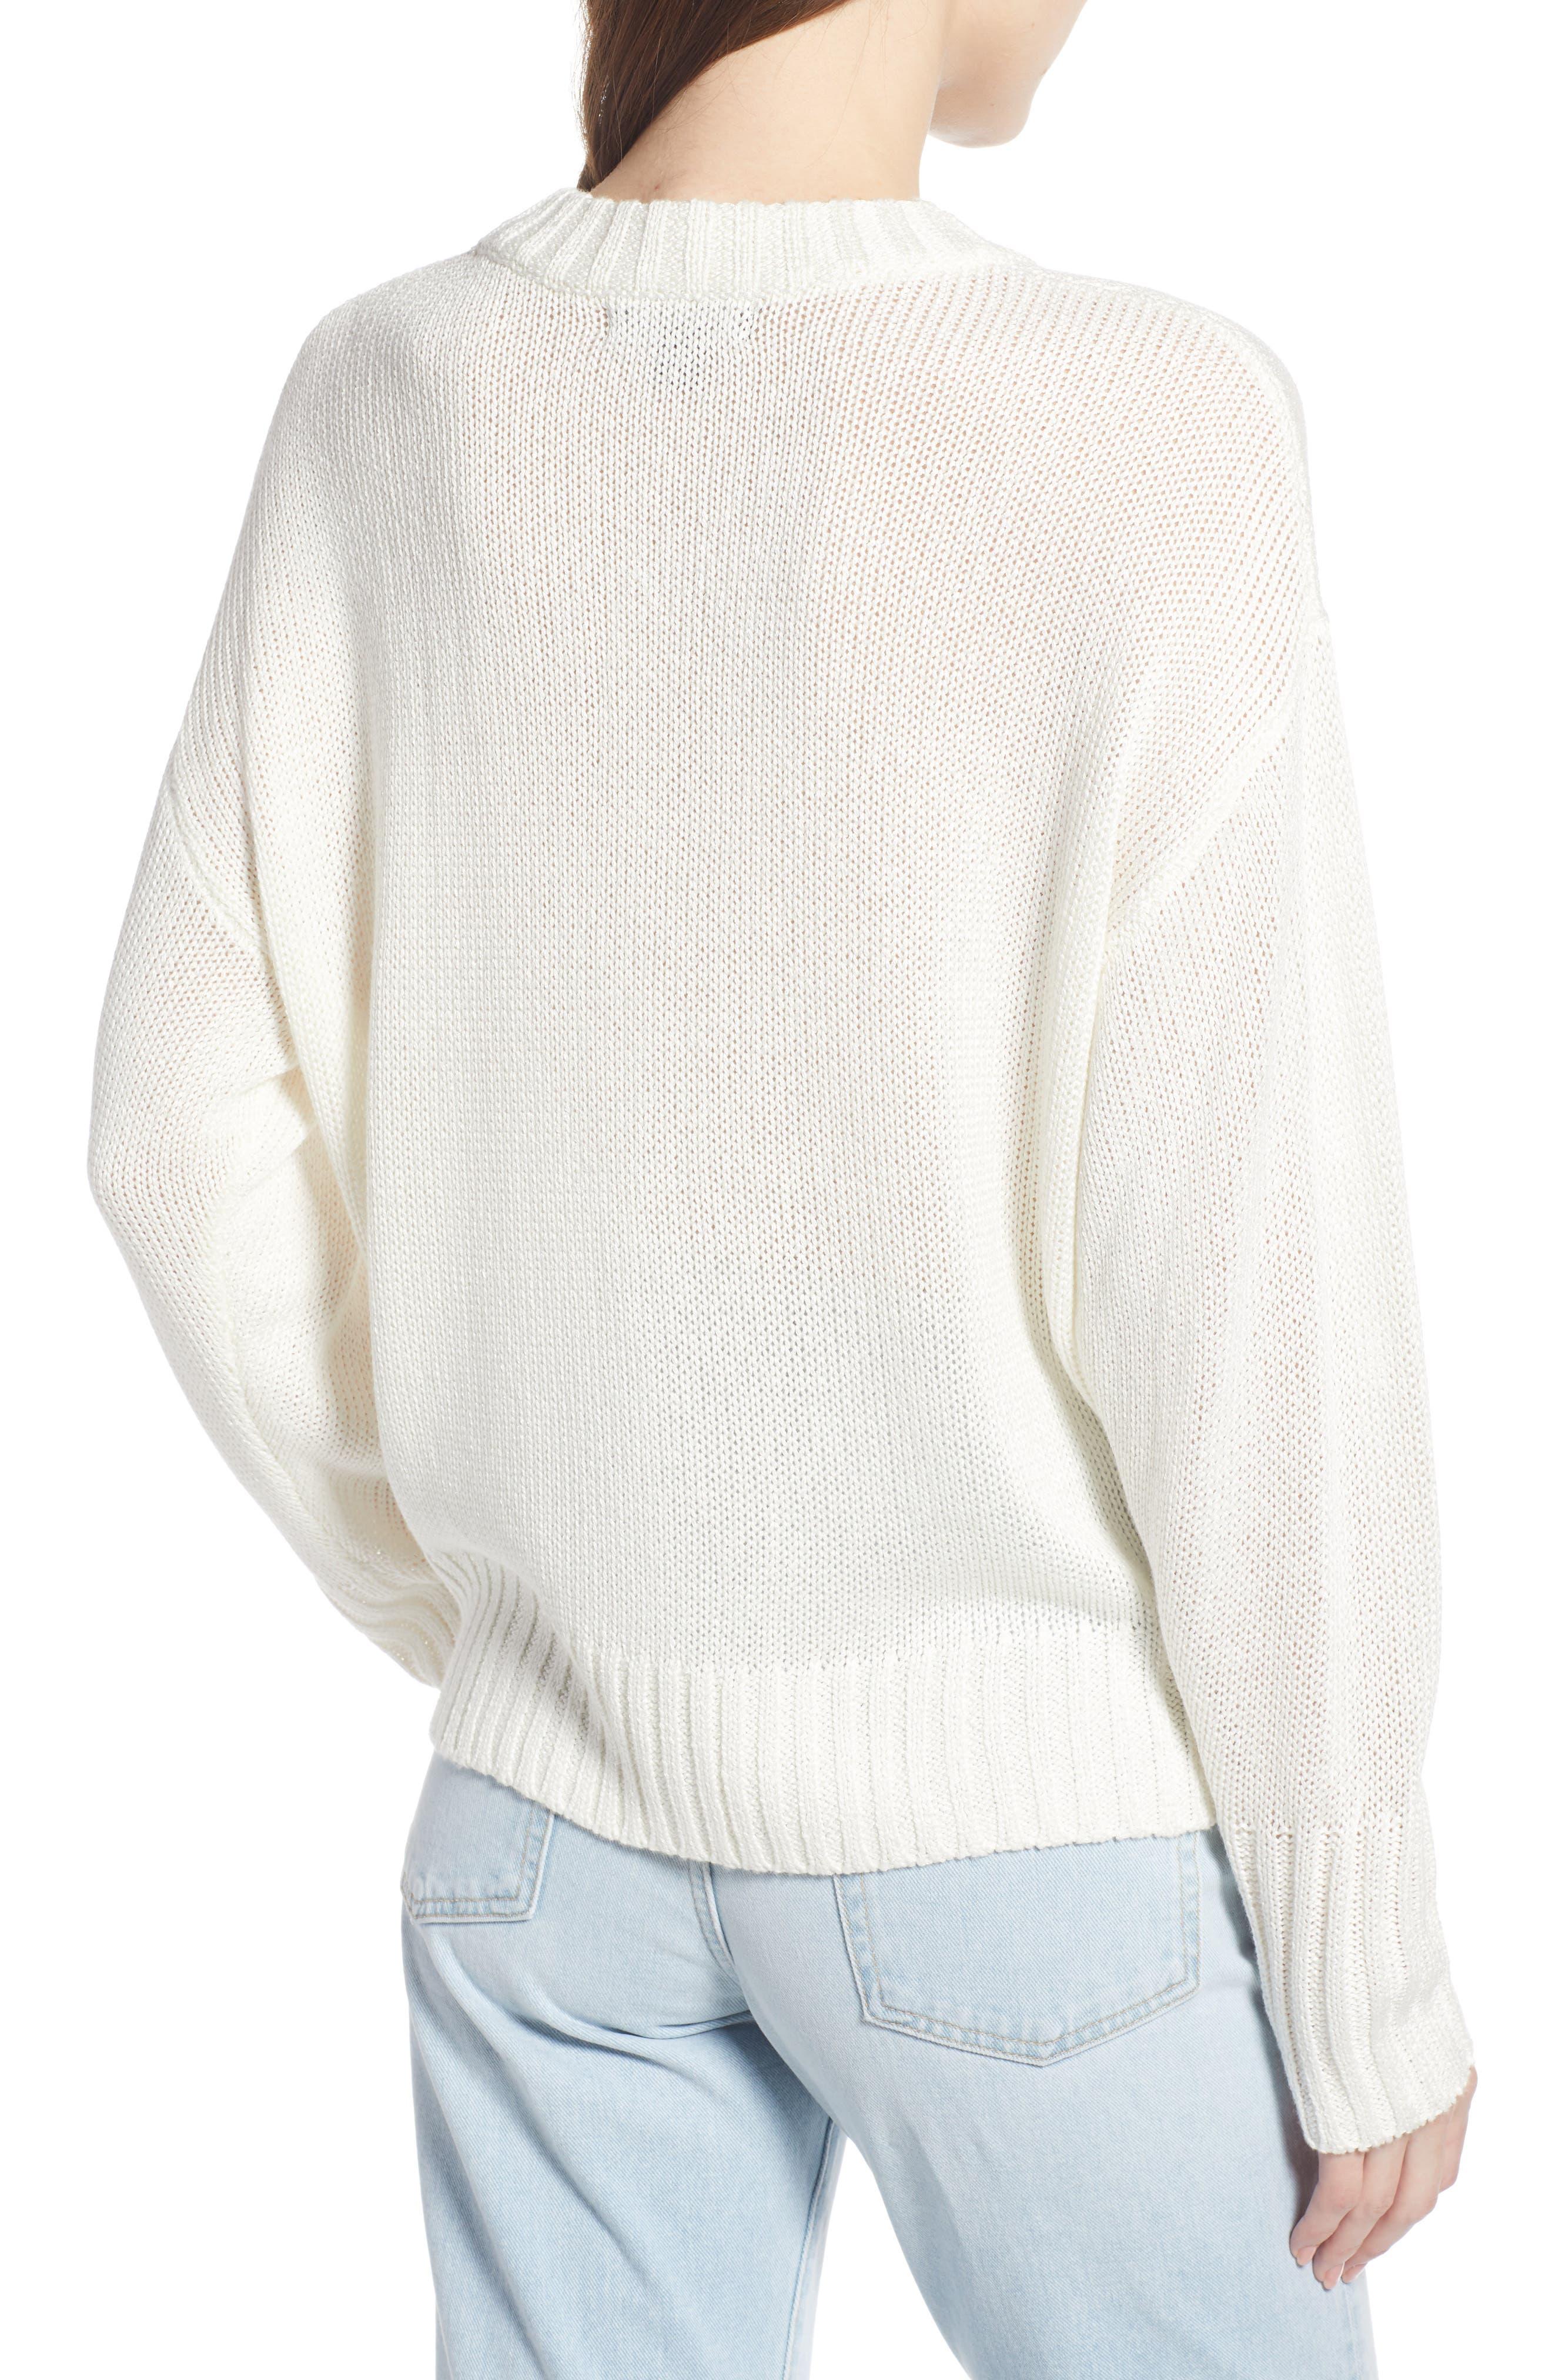 SOMETHING NAVY,                             Subtle Sheen Sweater,                             Alternate thumbnail 3, color,                             100